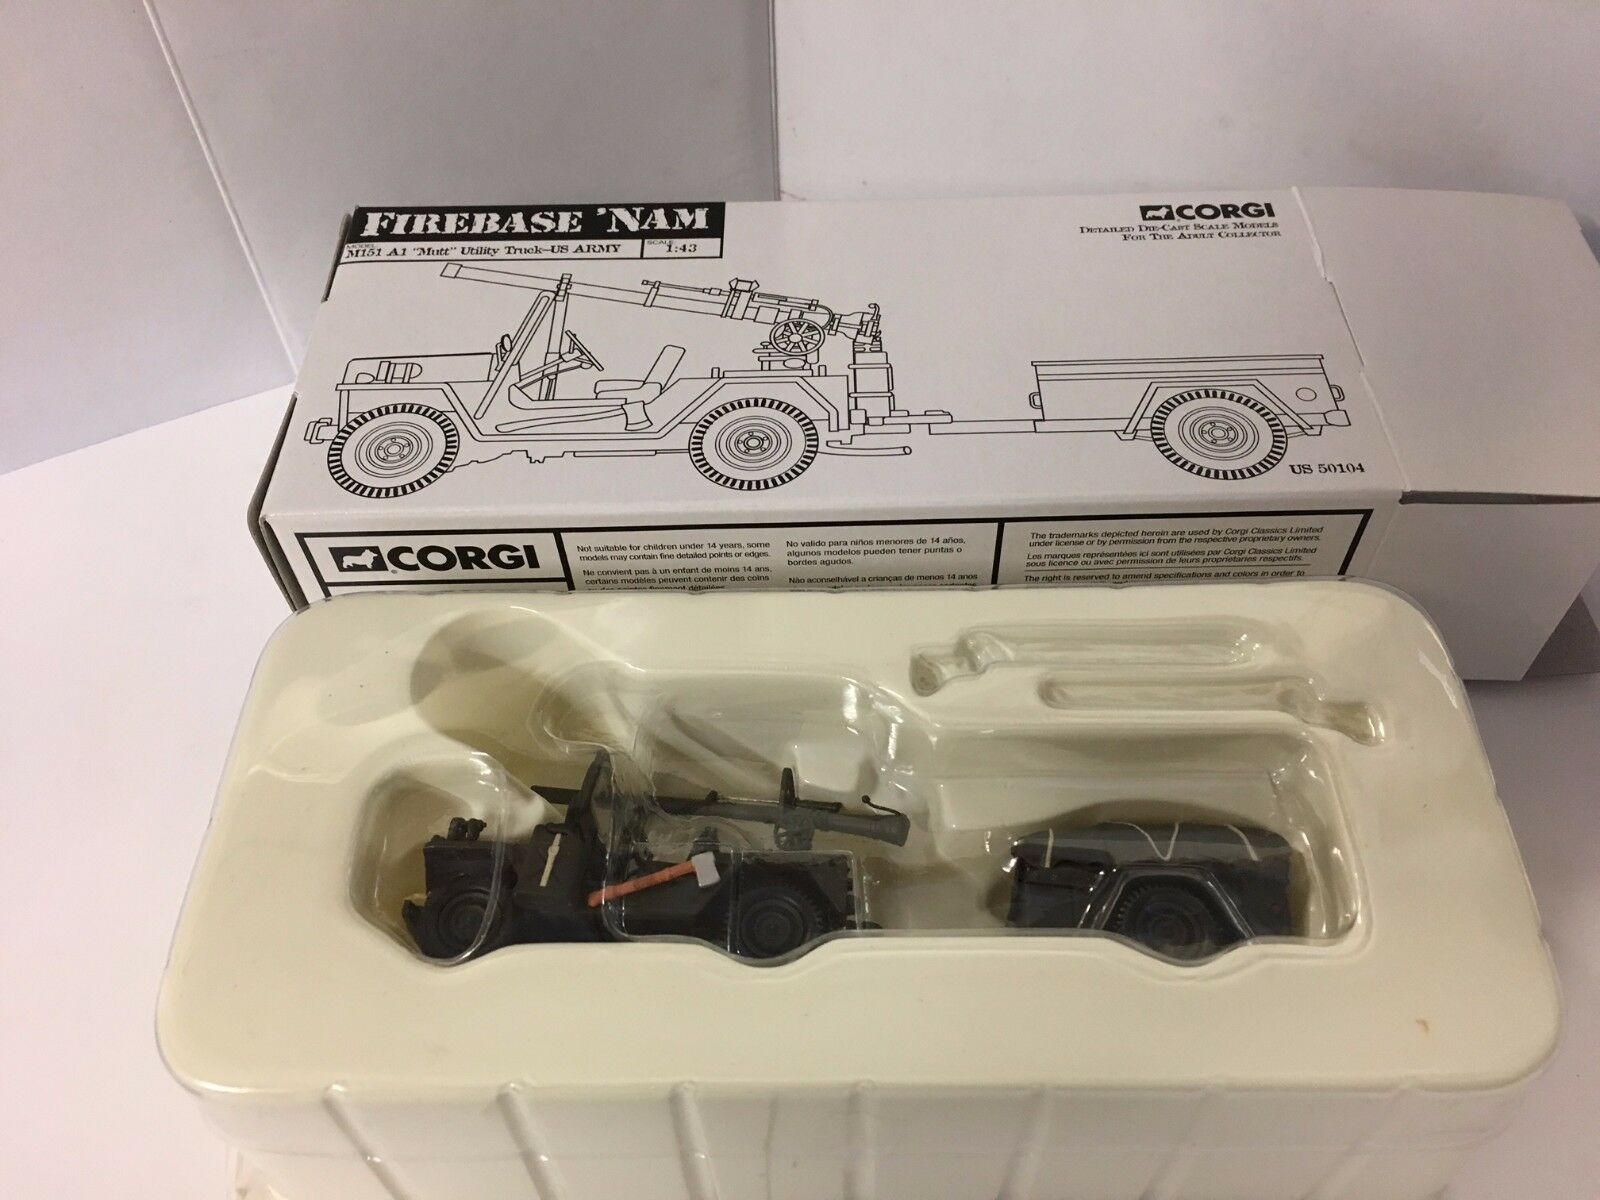 Corgi US50104 M151 M151 M151 A1 Mutt utilidad Camión-USMC 5c263d